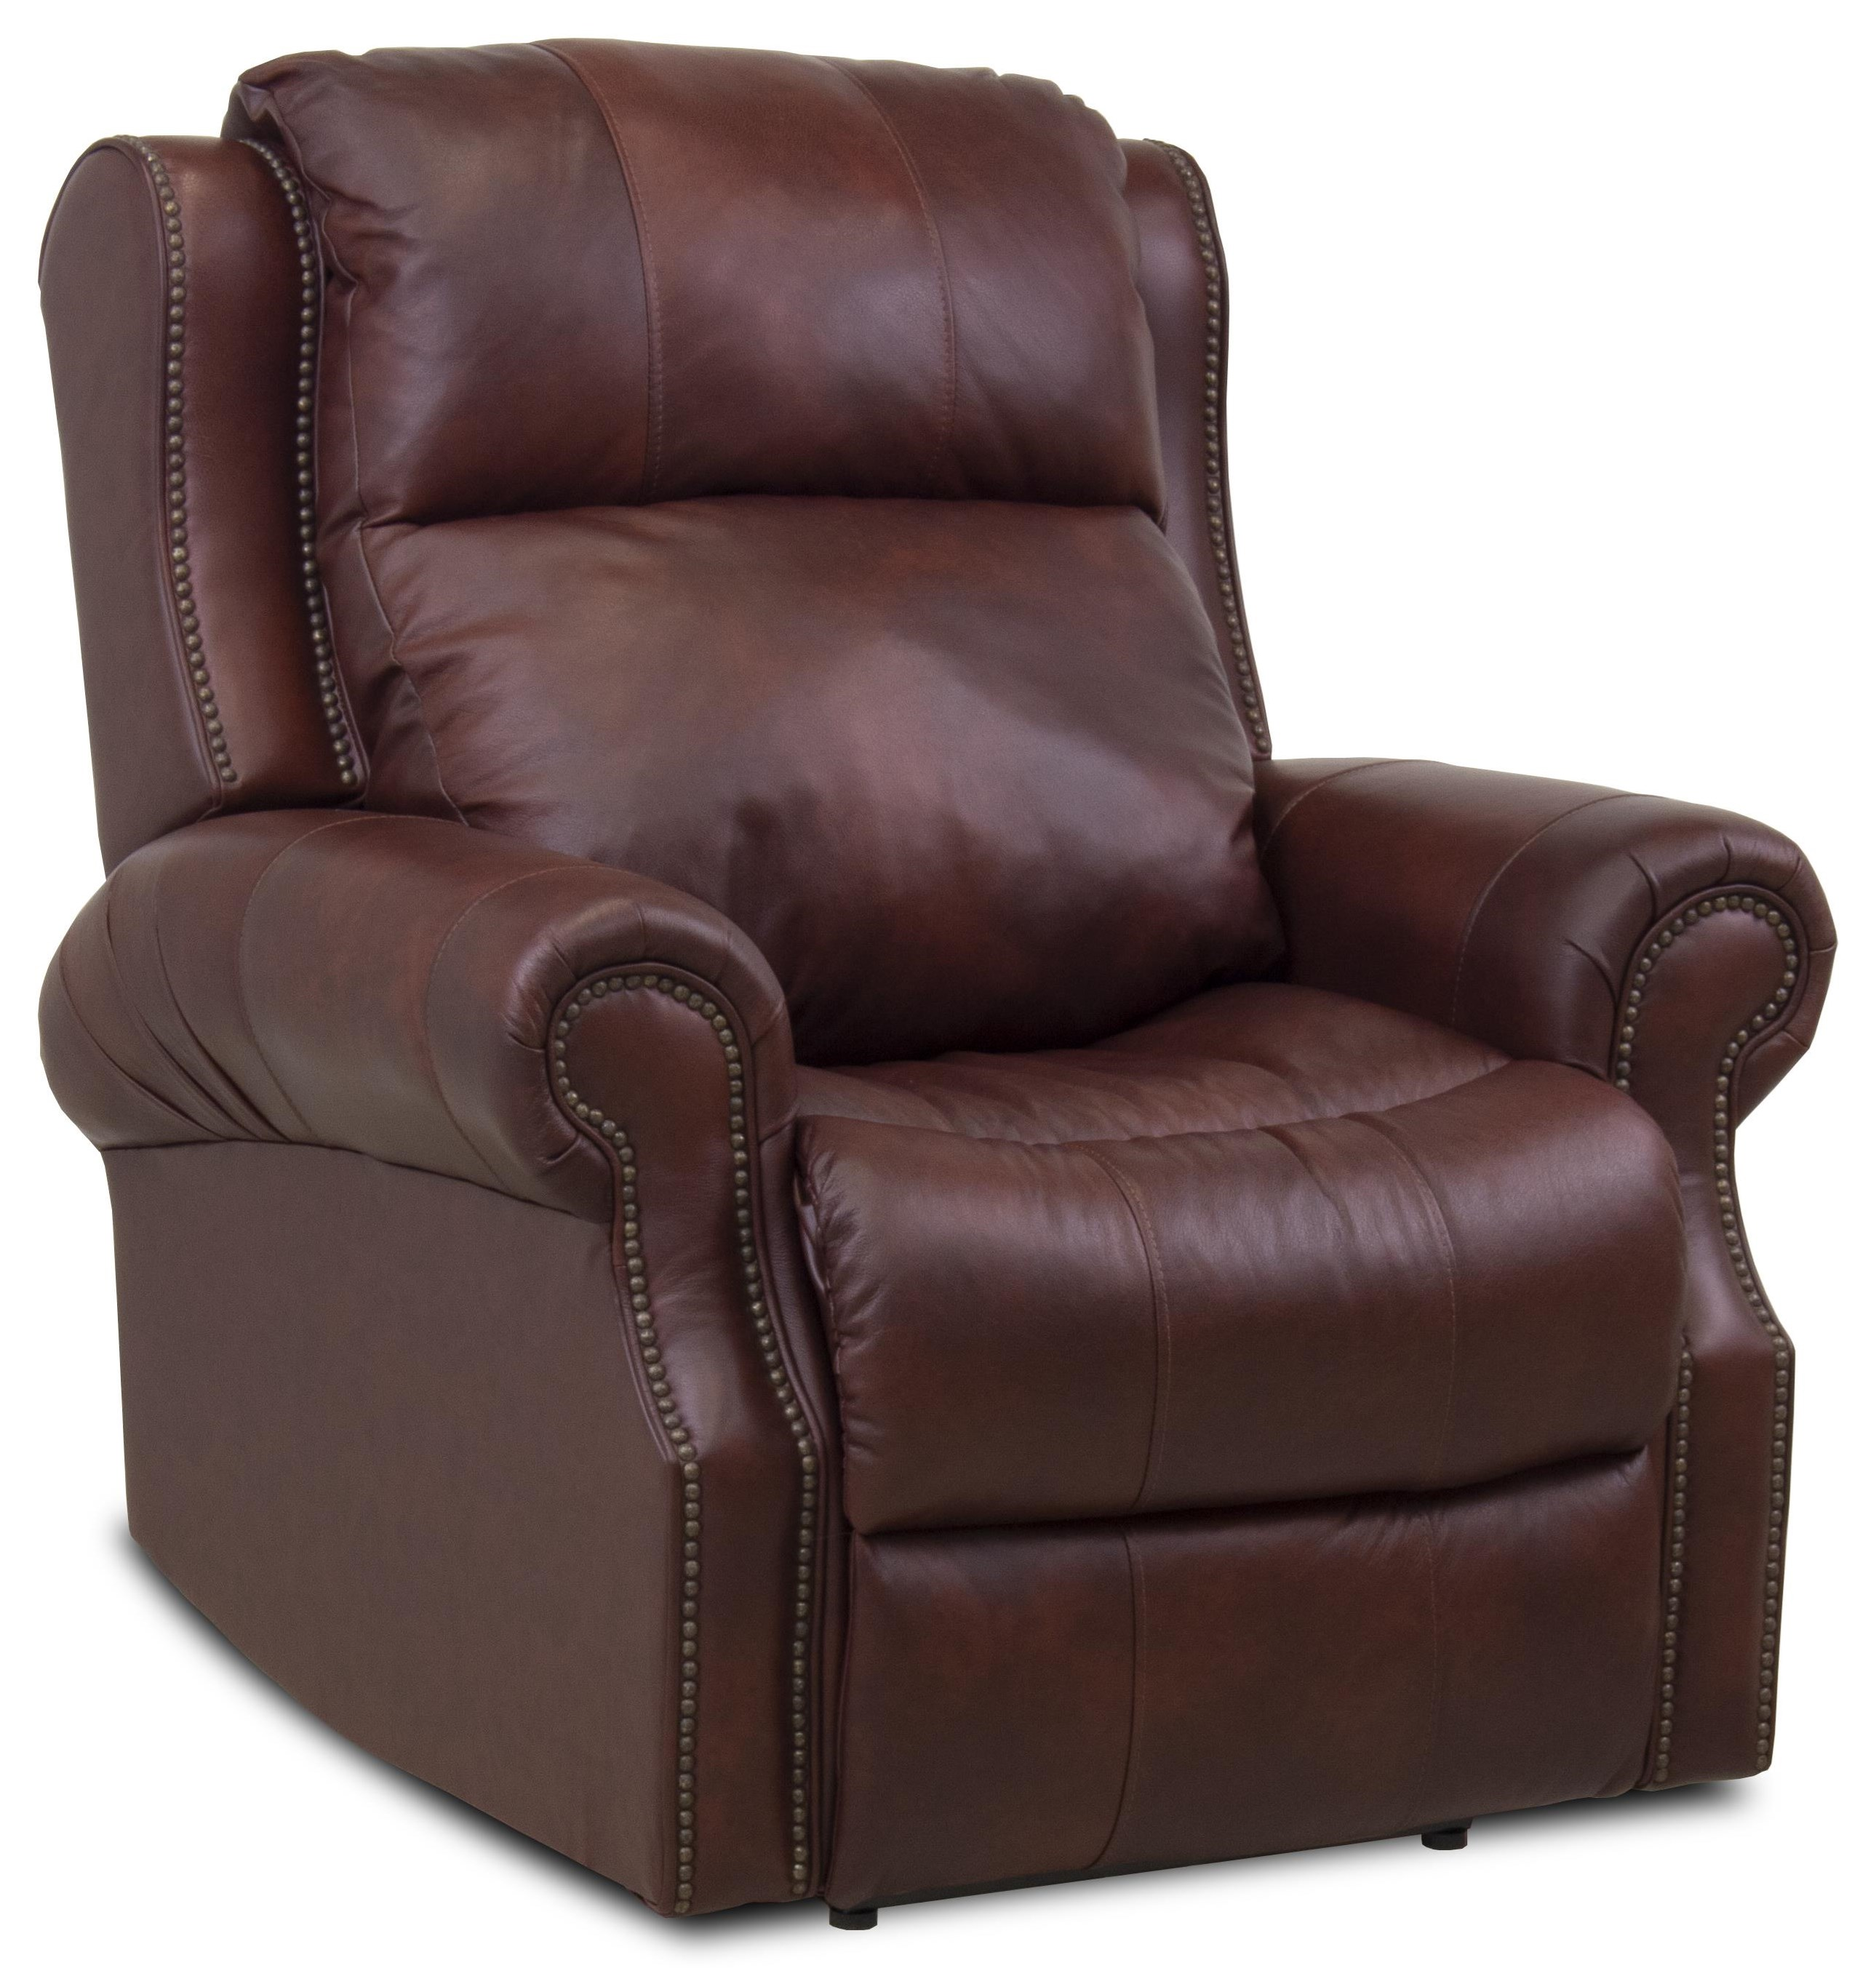 Pwr Rock Recl Chair w/ Pwr Head & Lumbar